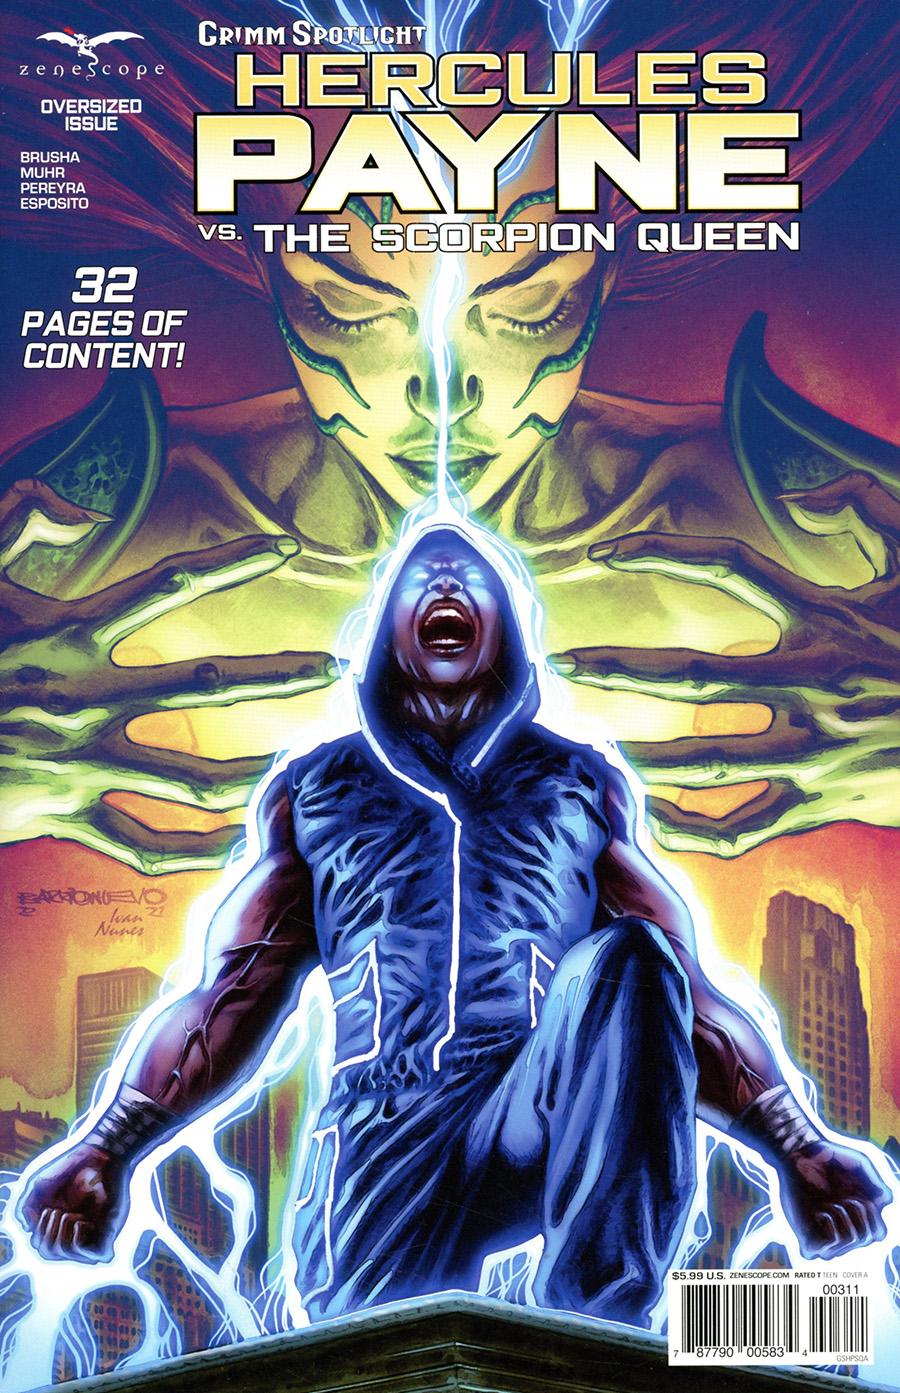 Grimm Spotlight Hercules Payne vs Scorpion Queen Cover A Al Barrionuevo